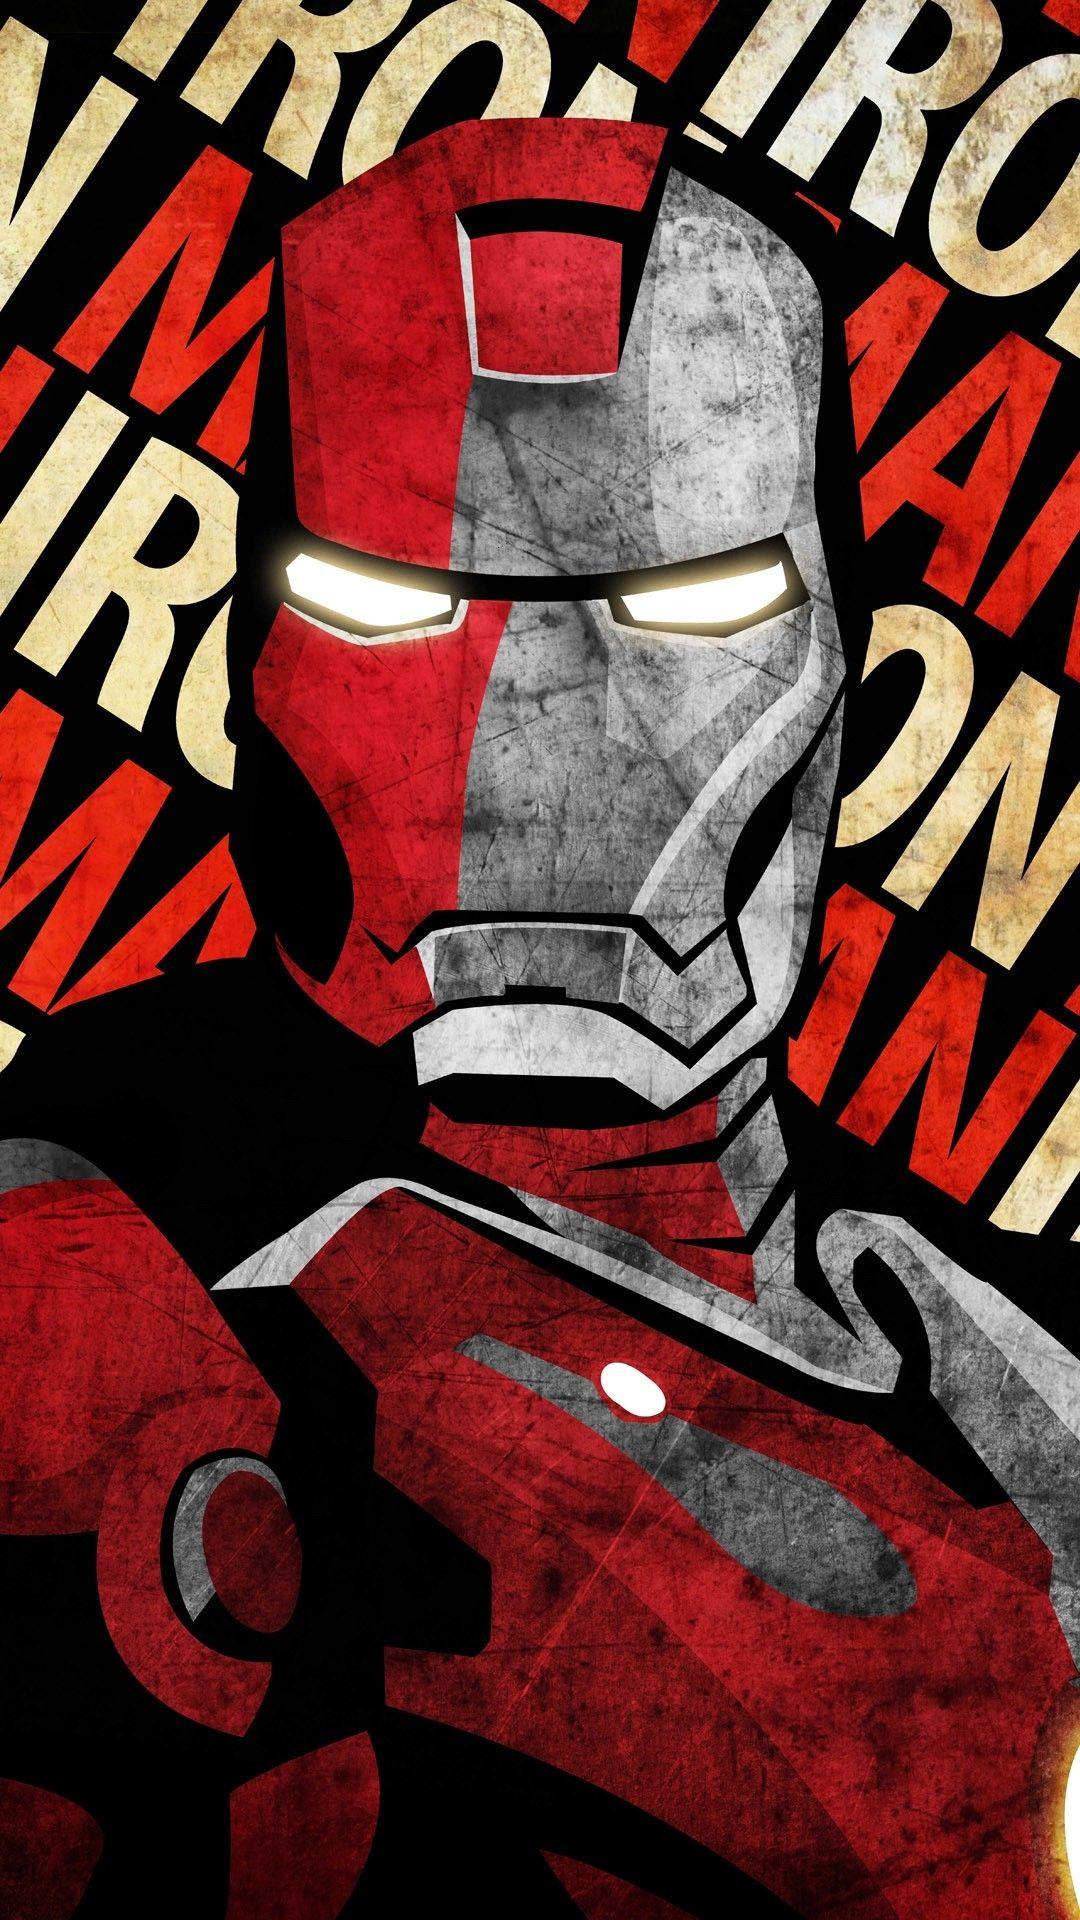 Iron Man HD Wallpapers Backgrounds Wallpaper